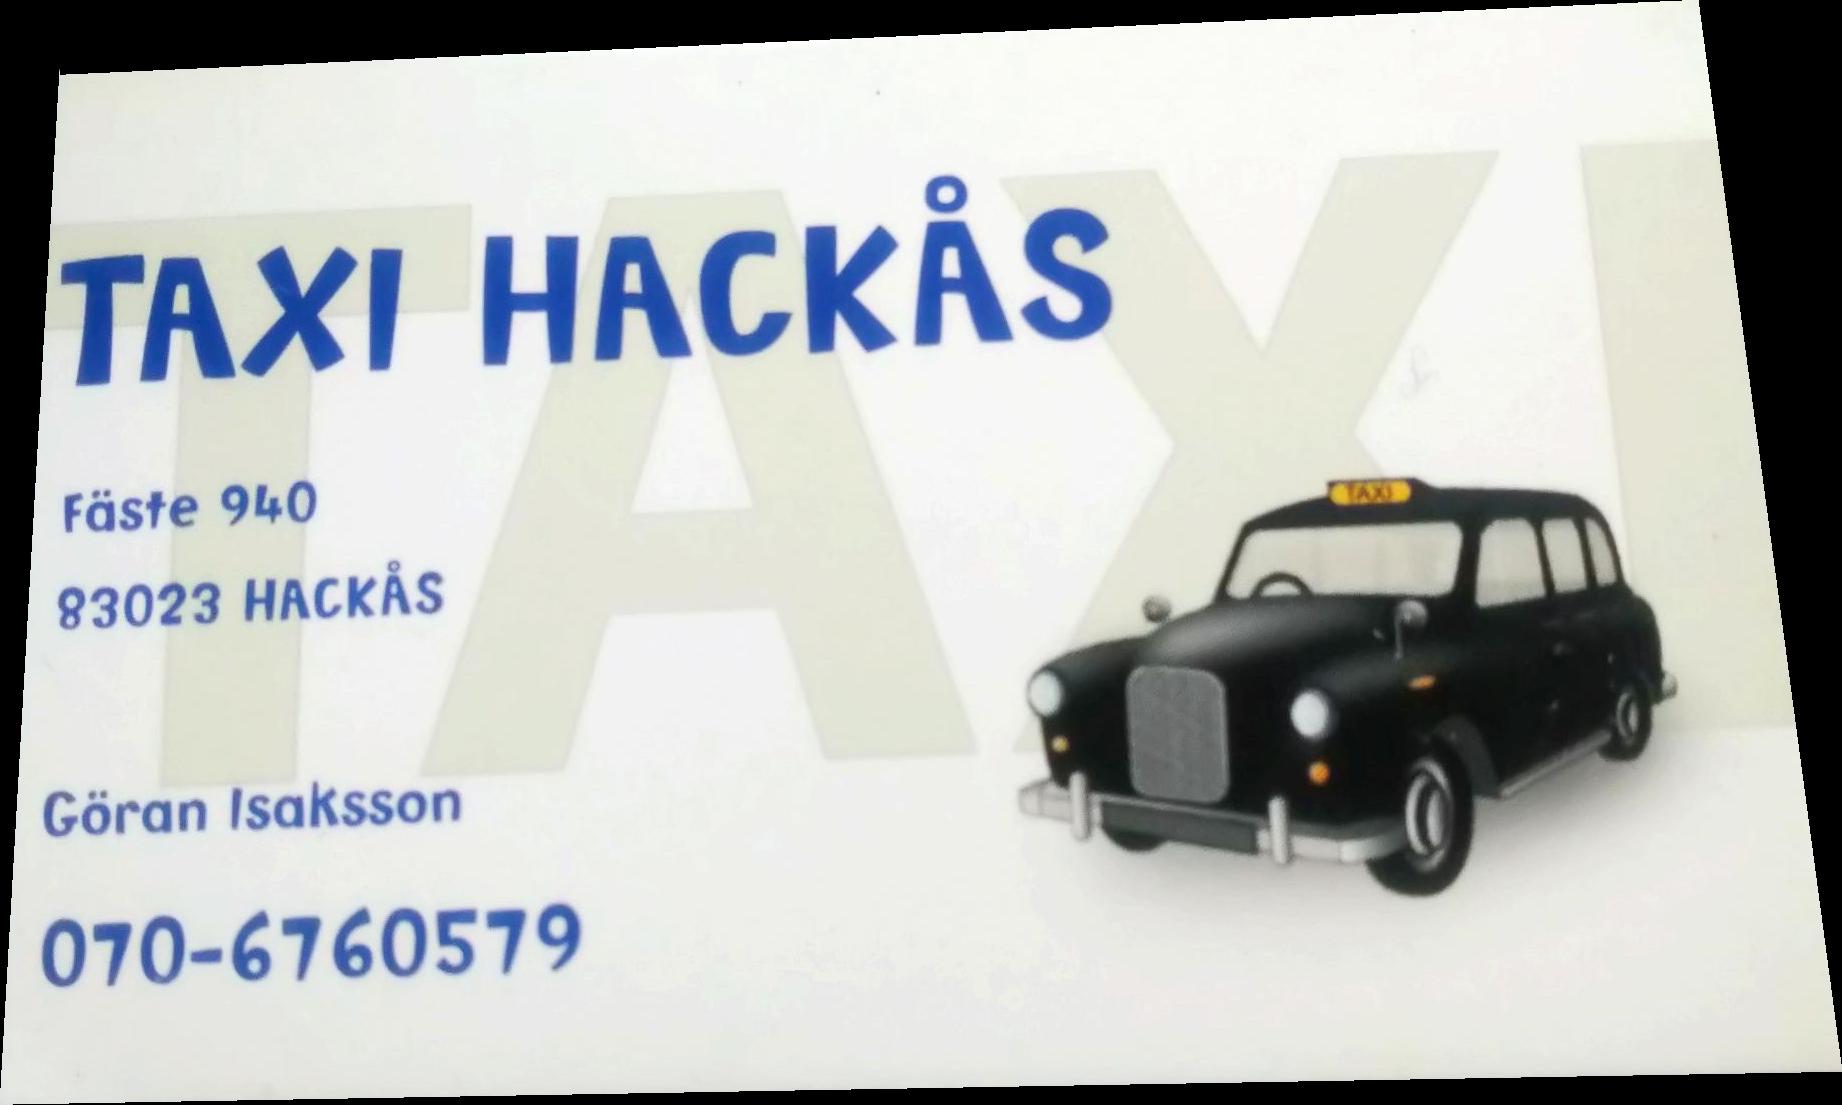 Taxi Hackås